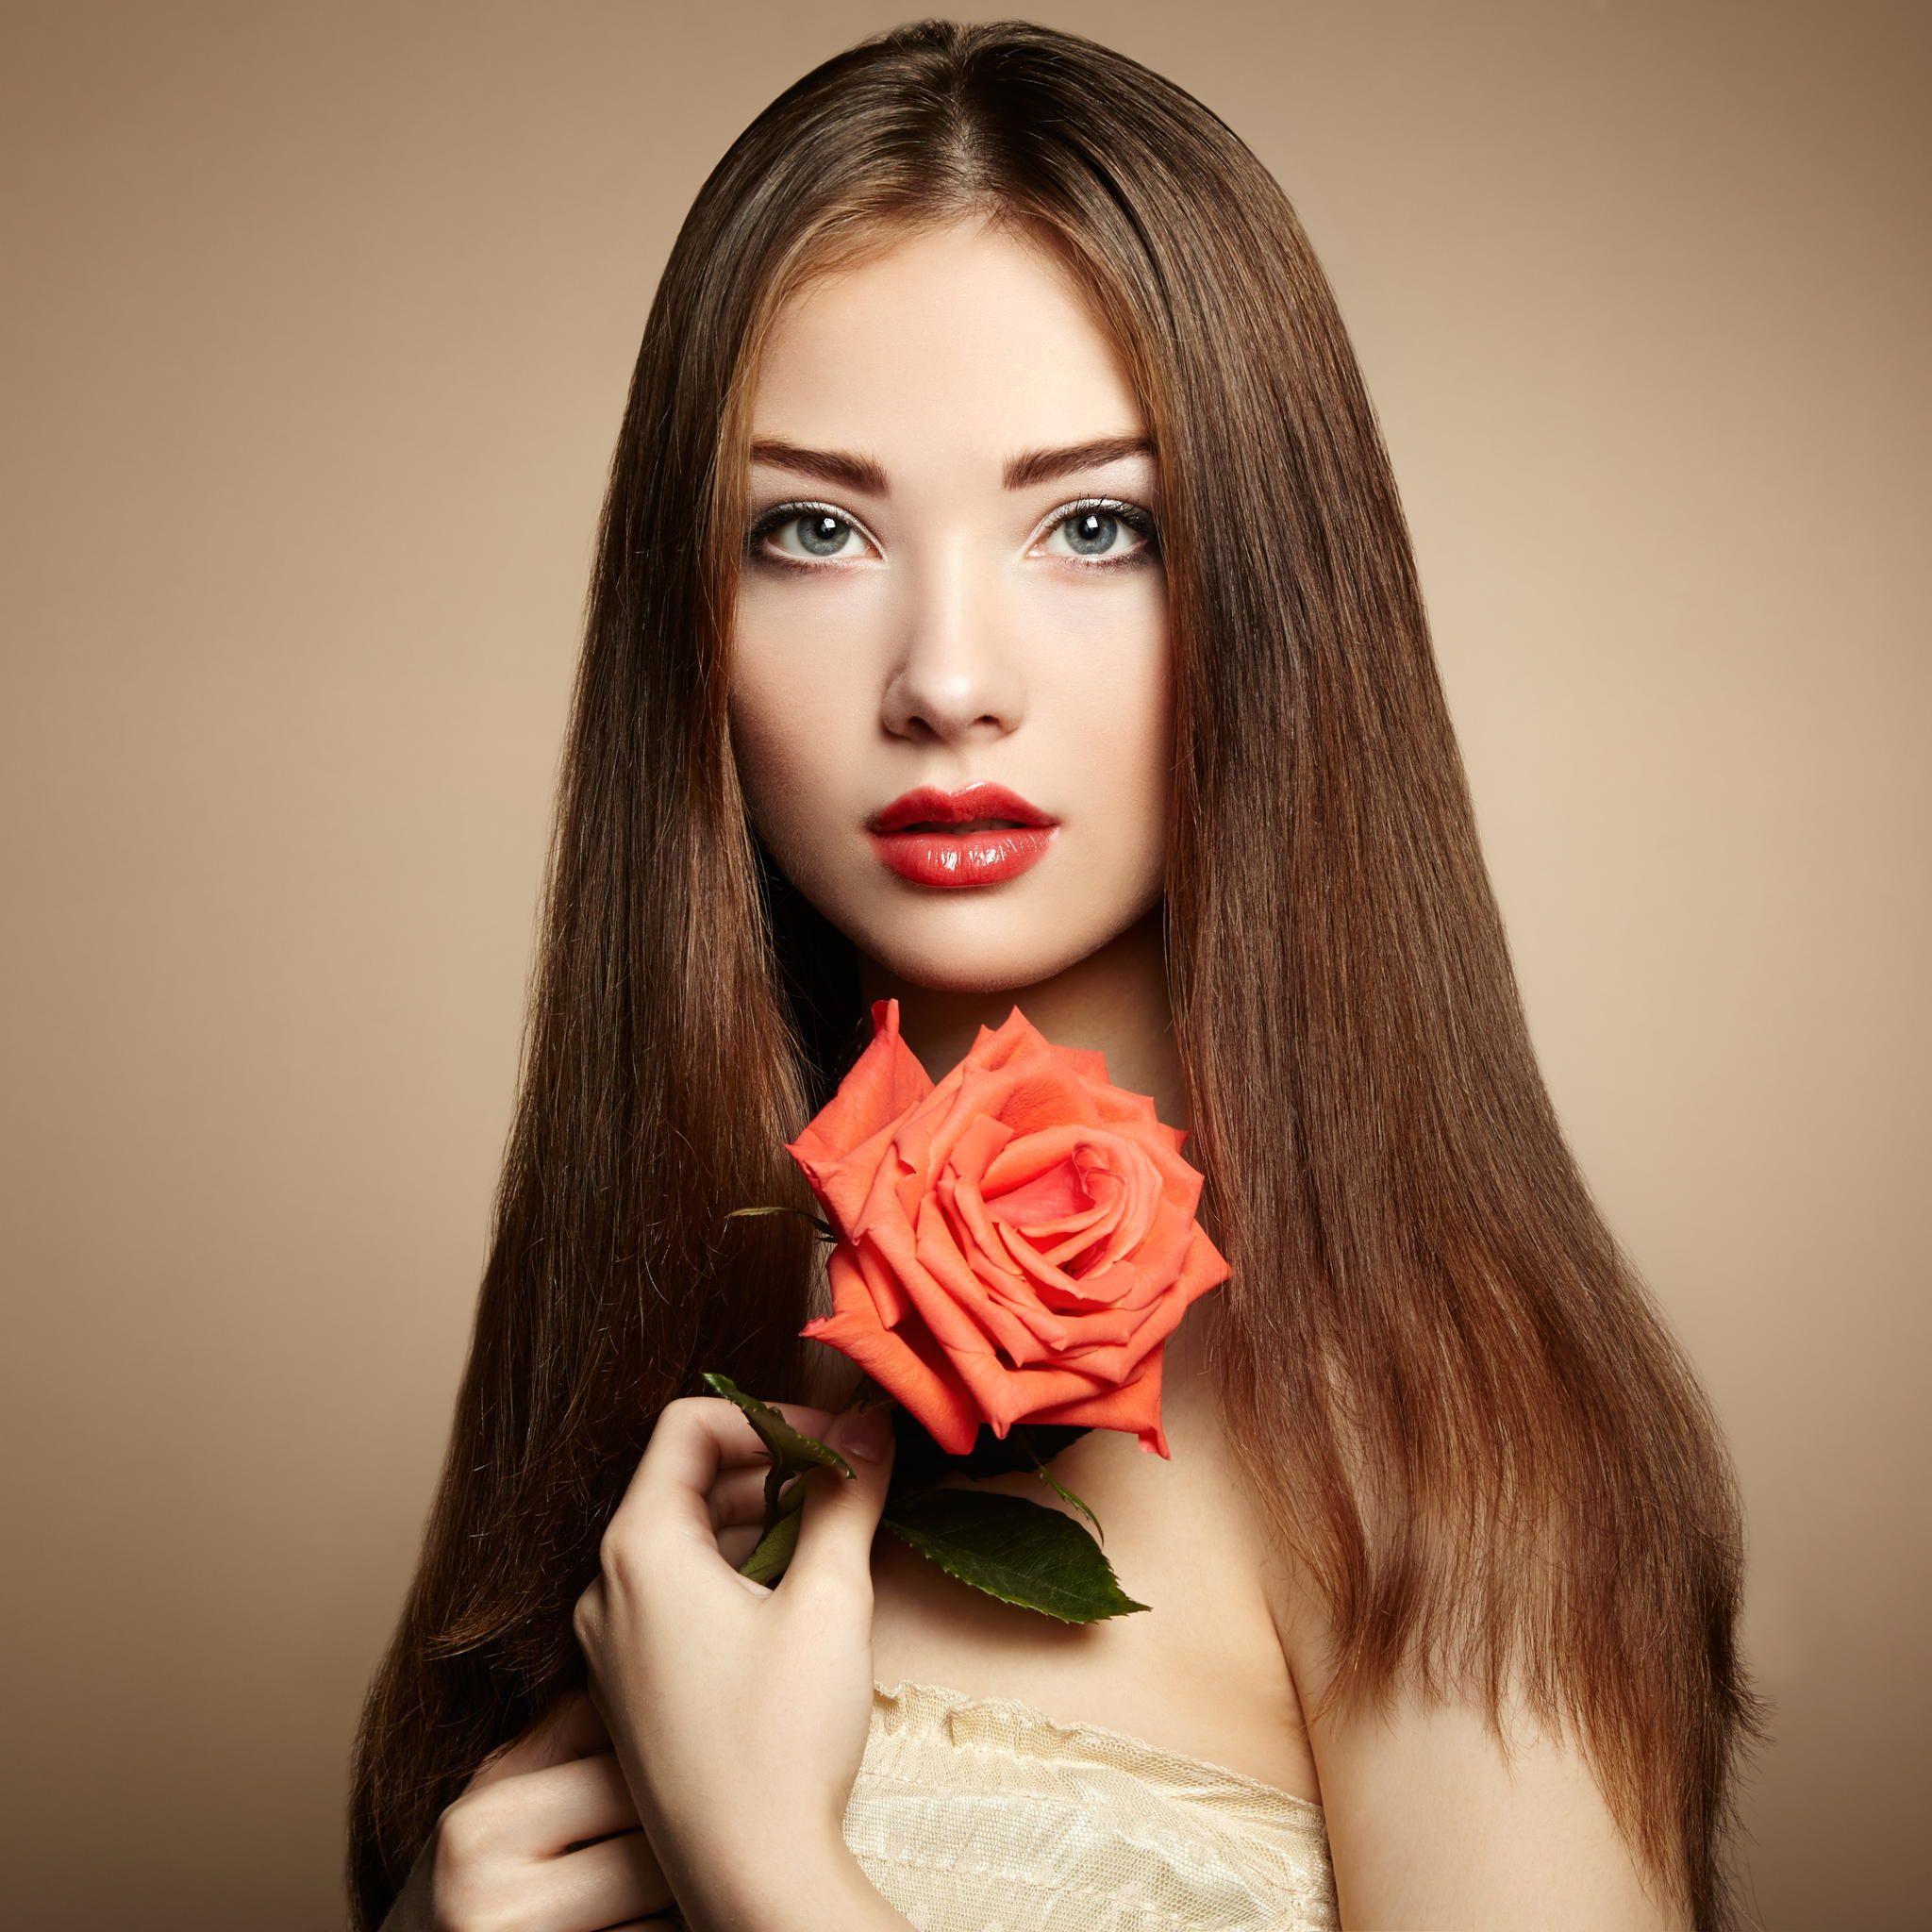 Alexandra portrait of beautiful dark haired woman with flowers alexandra portrait of beautiful dark haired woman with flowers fashion photo izmirmasajfo